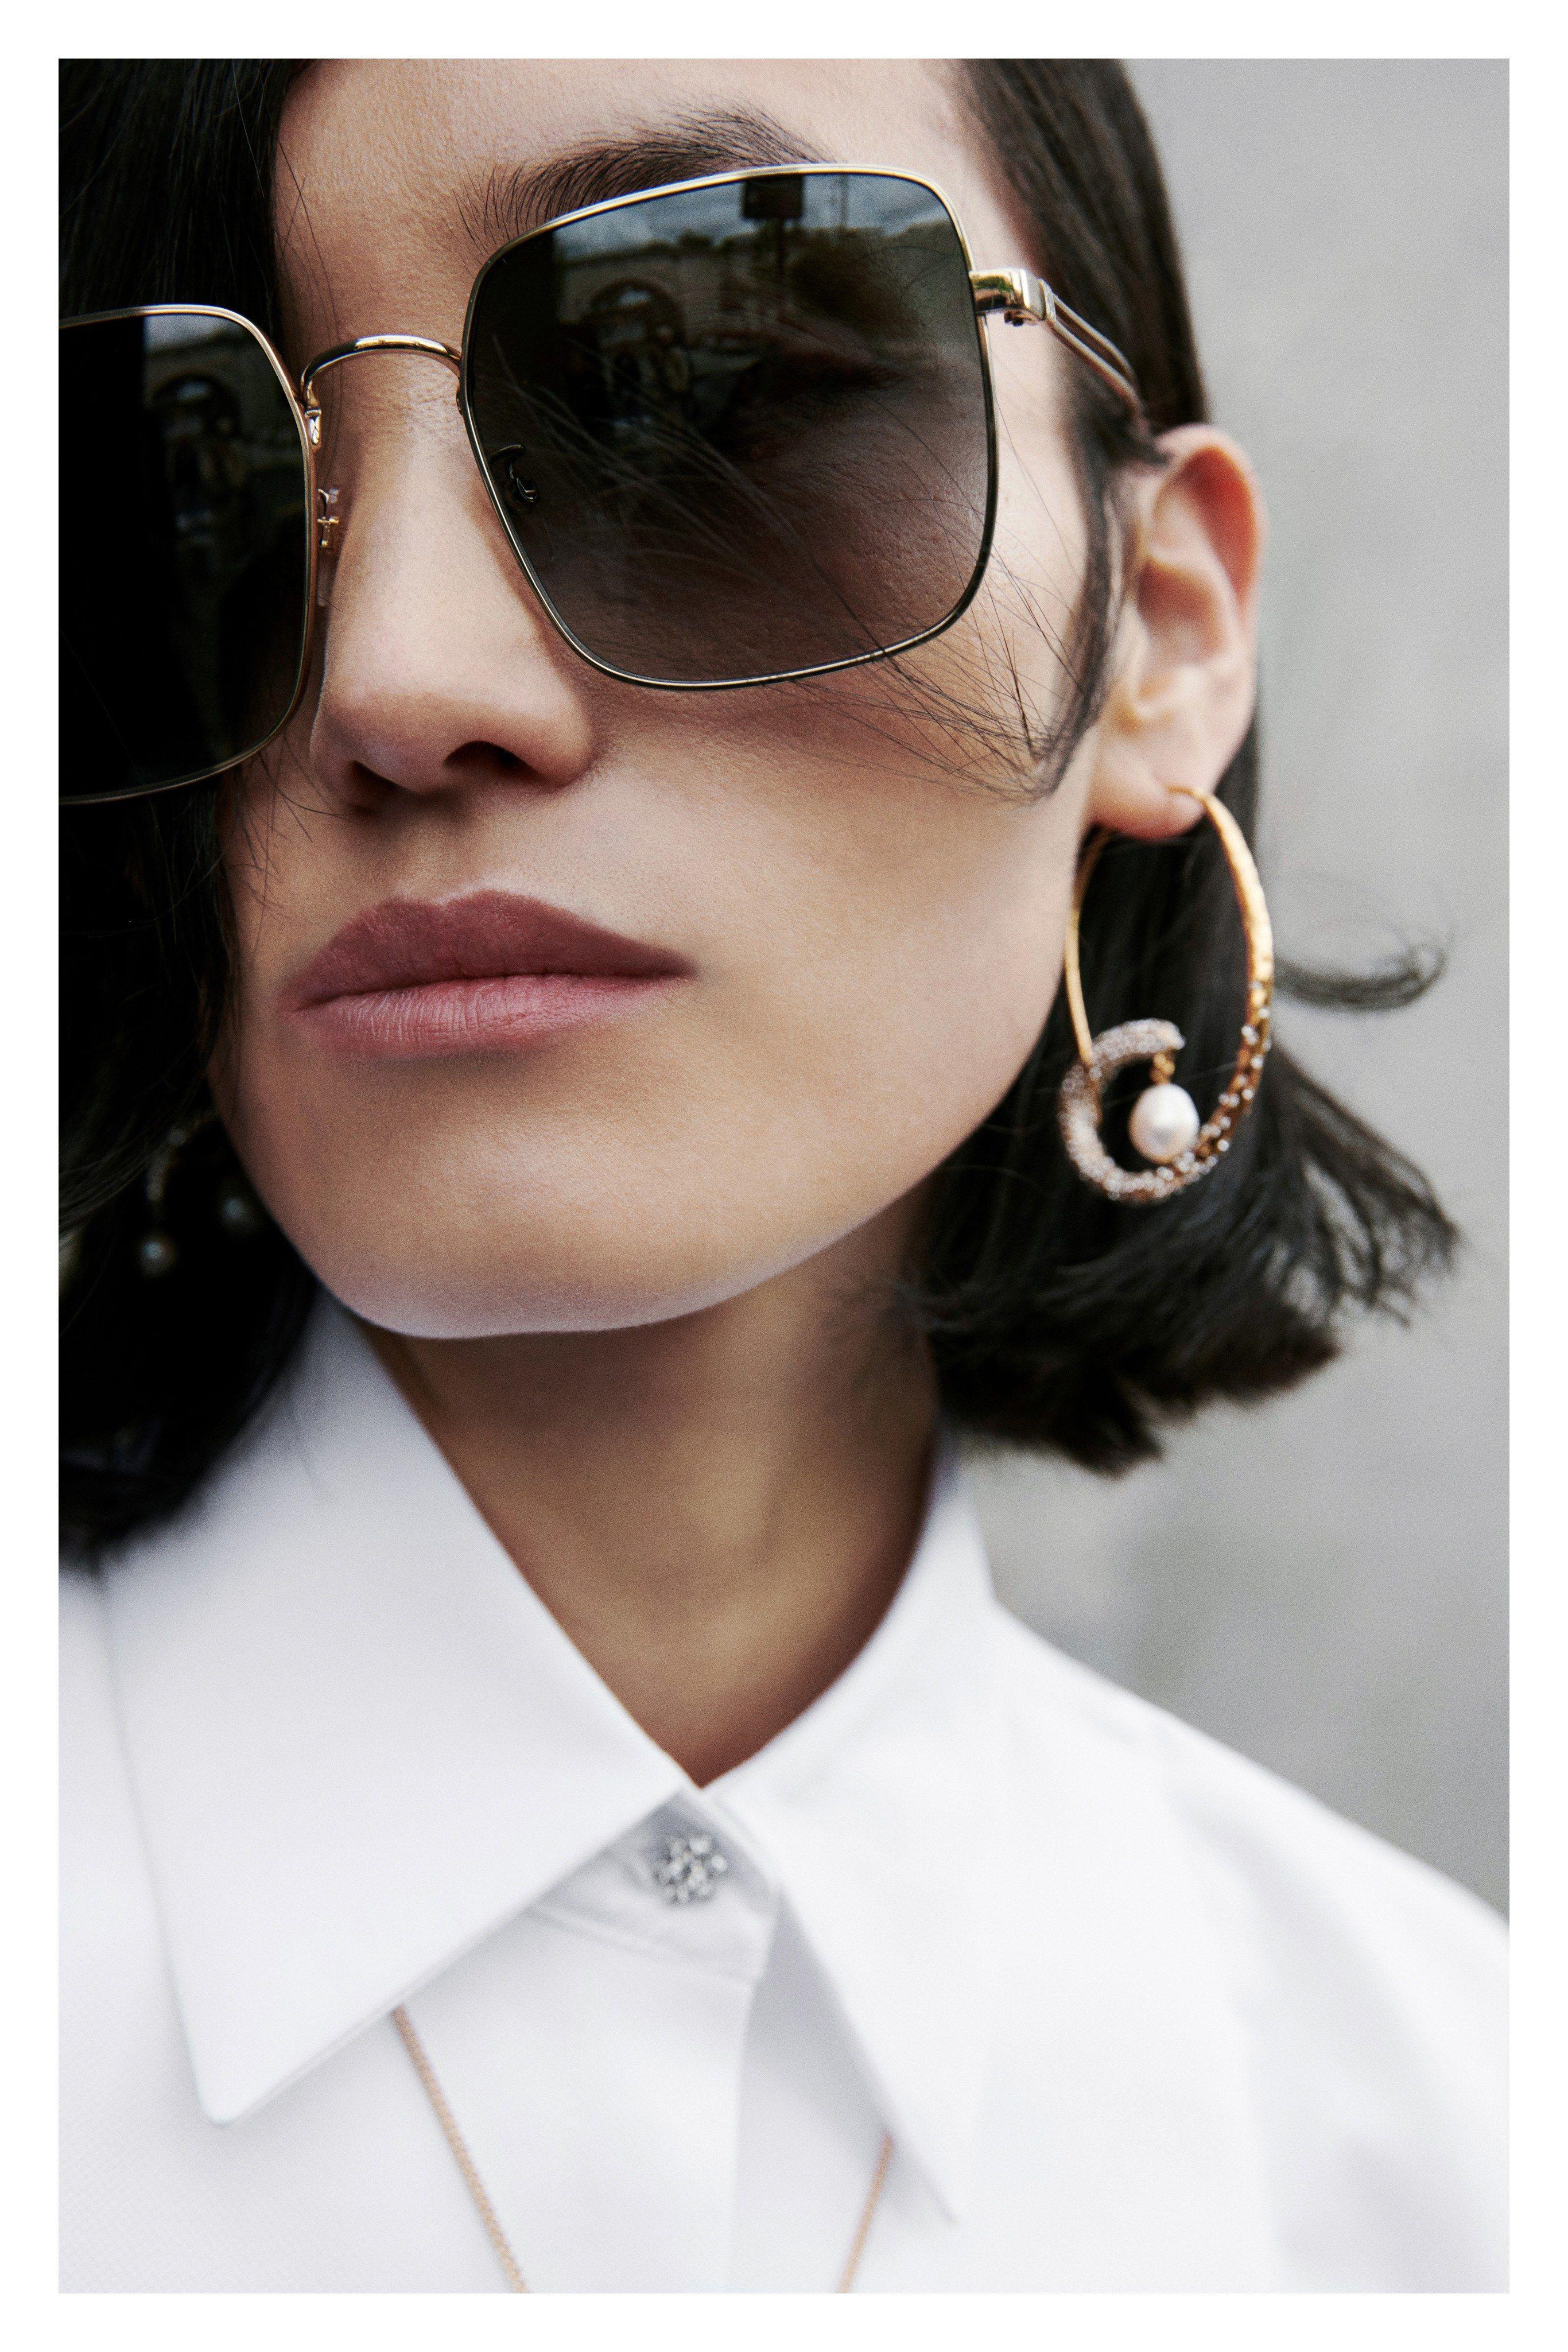 Sunglass Trends 2020.Givenchy Resort 2020 Fashion Show In 2019 Fashion Eyewear